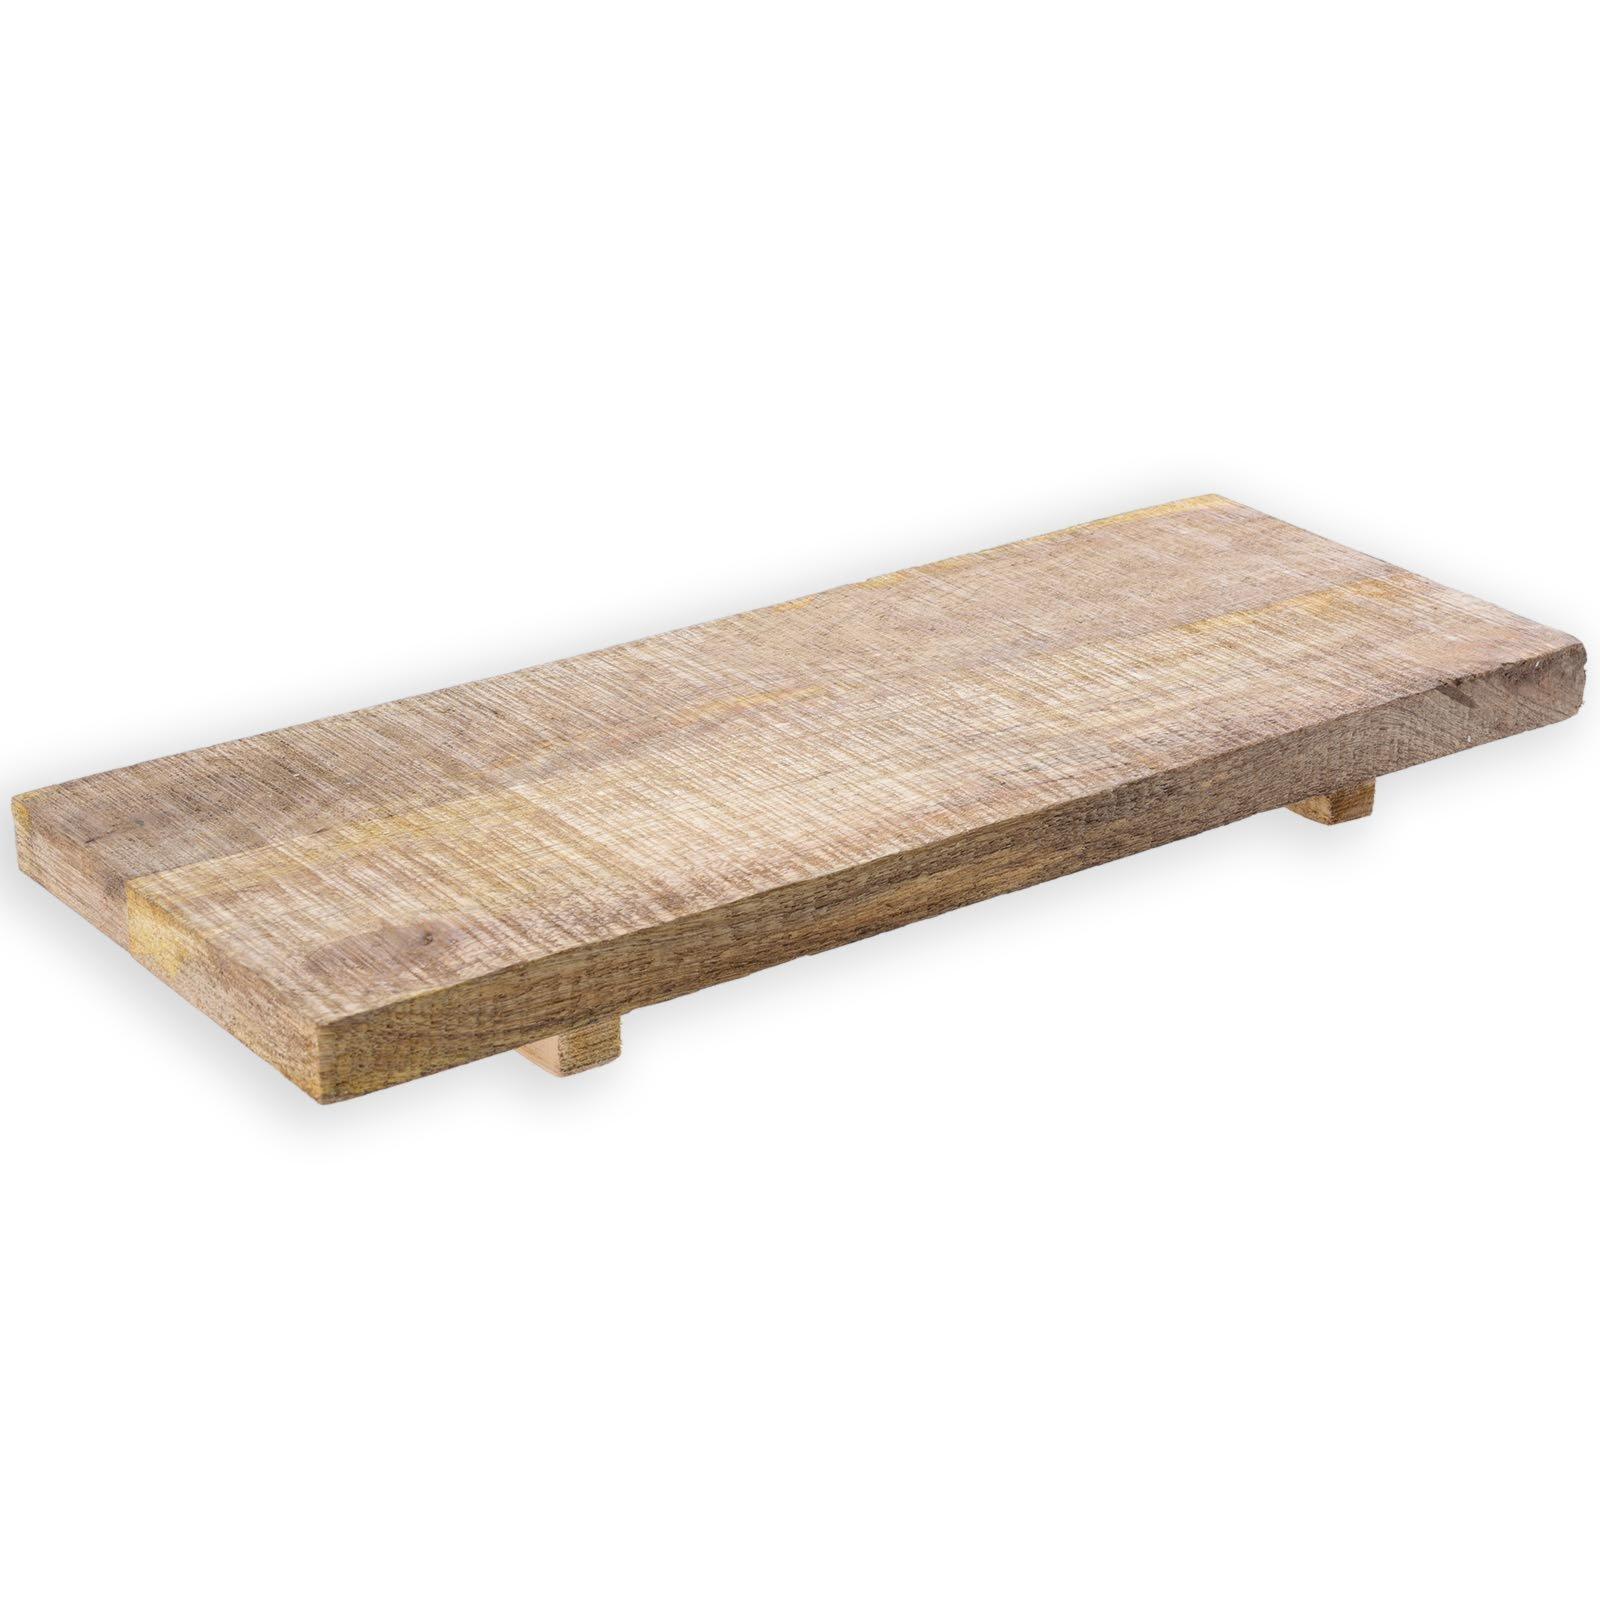 Deko-Tablett - Holz - 15,5x40,5 cm